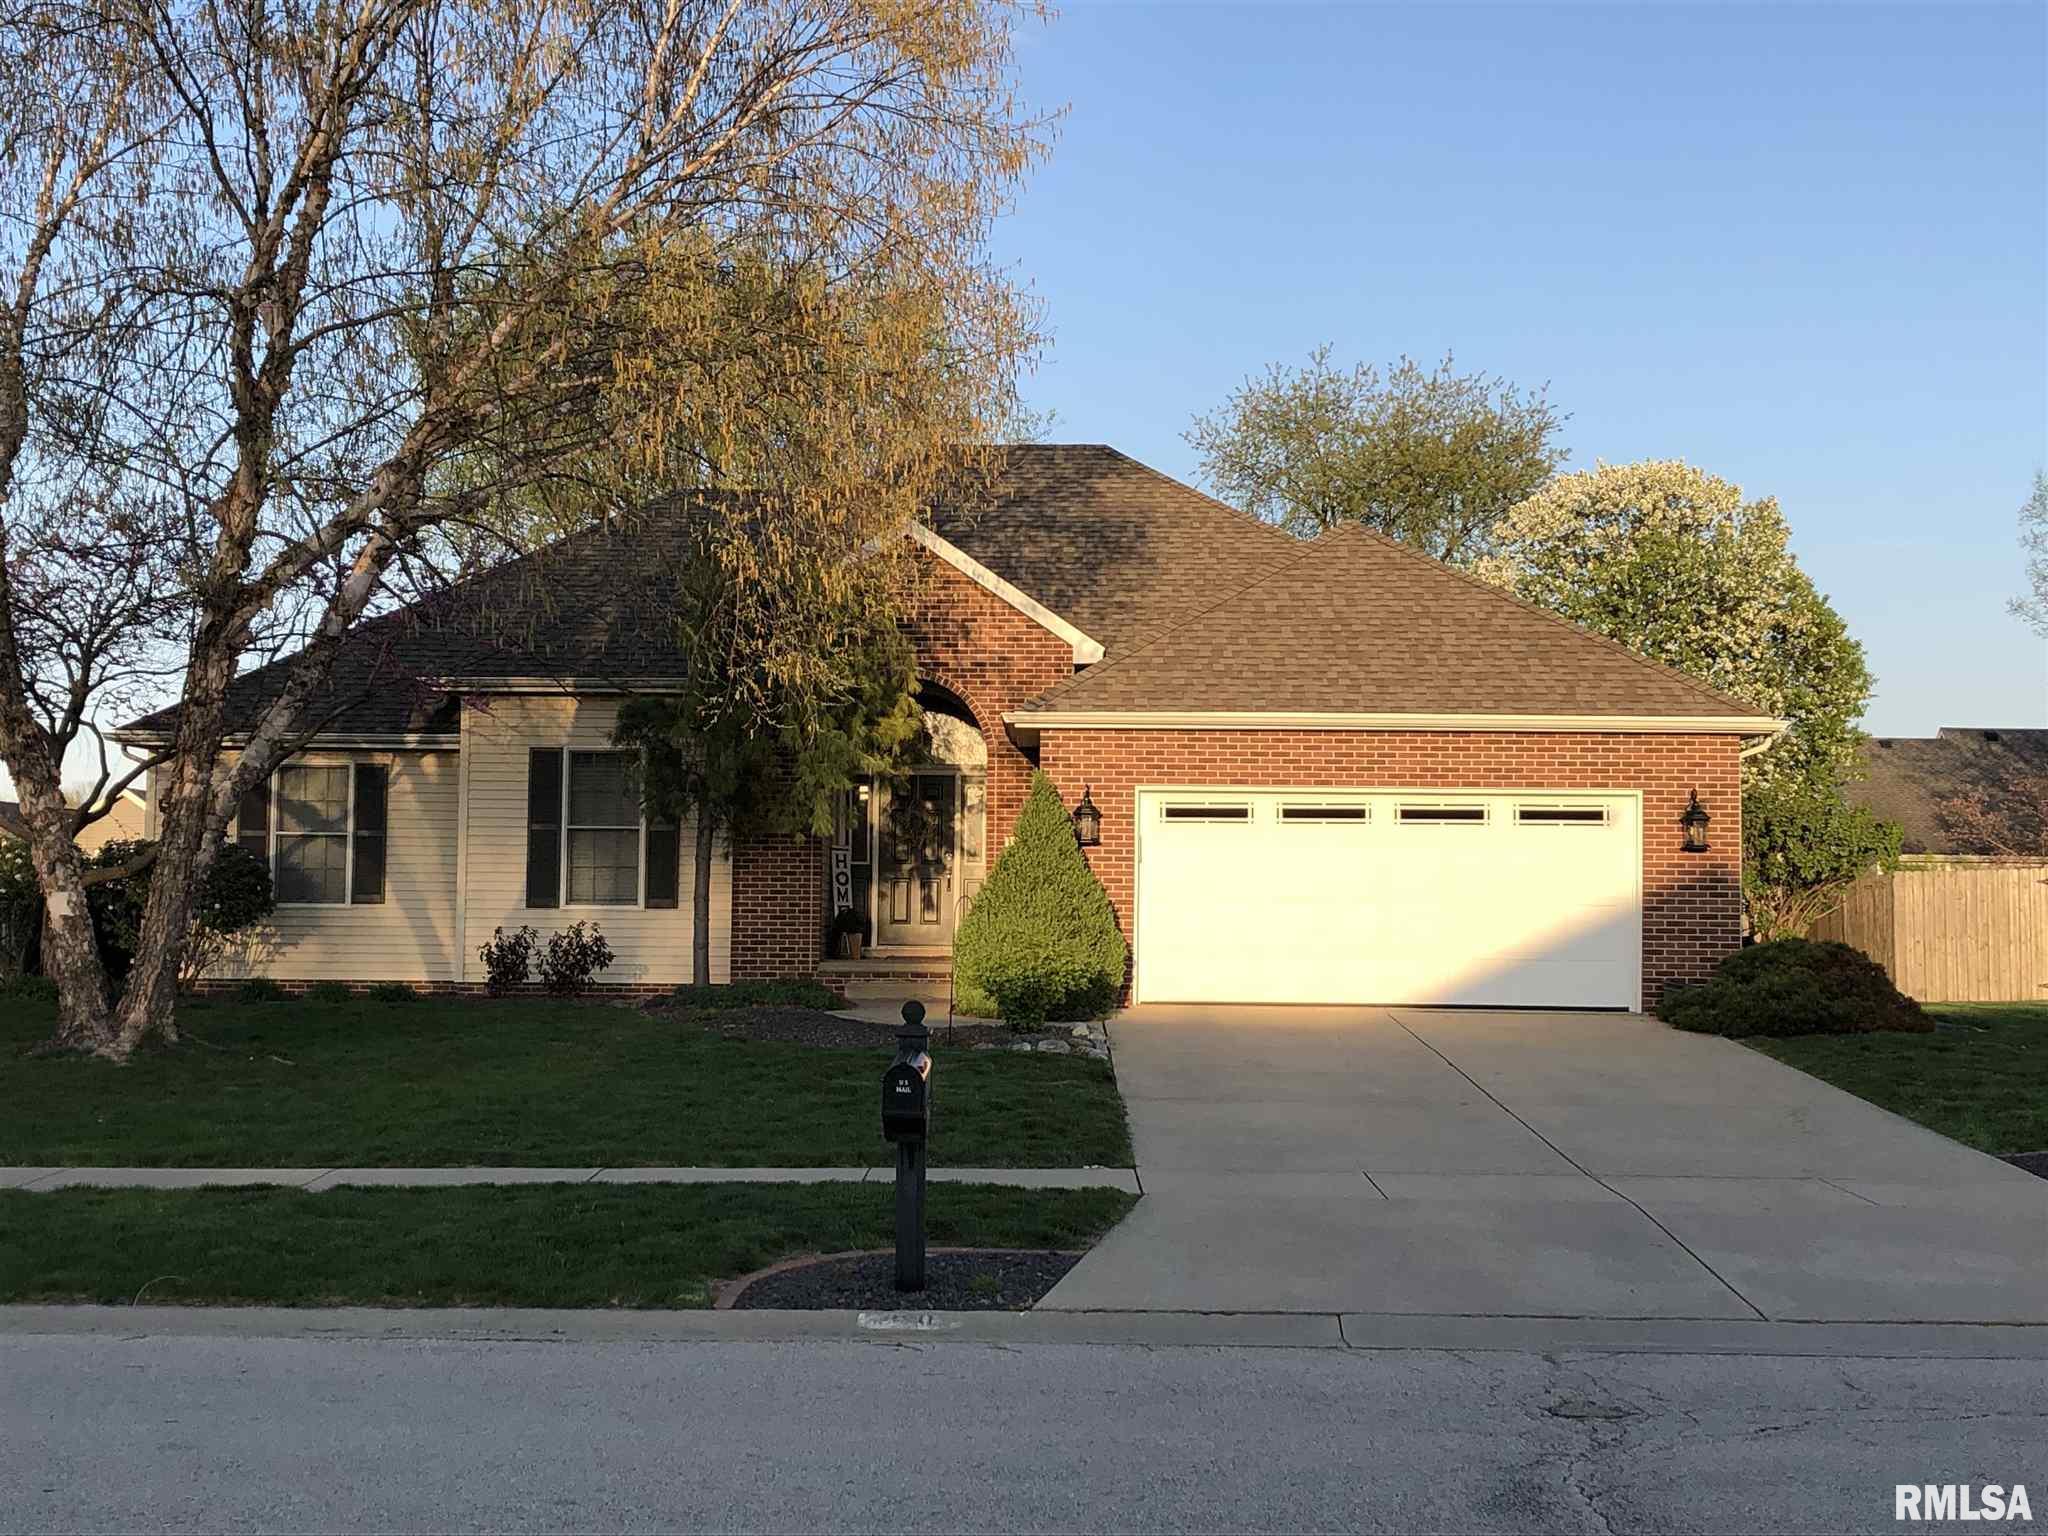 820 S 1ST Property Photo - Sherman, IL real estate listing